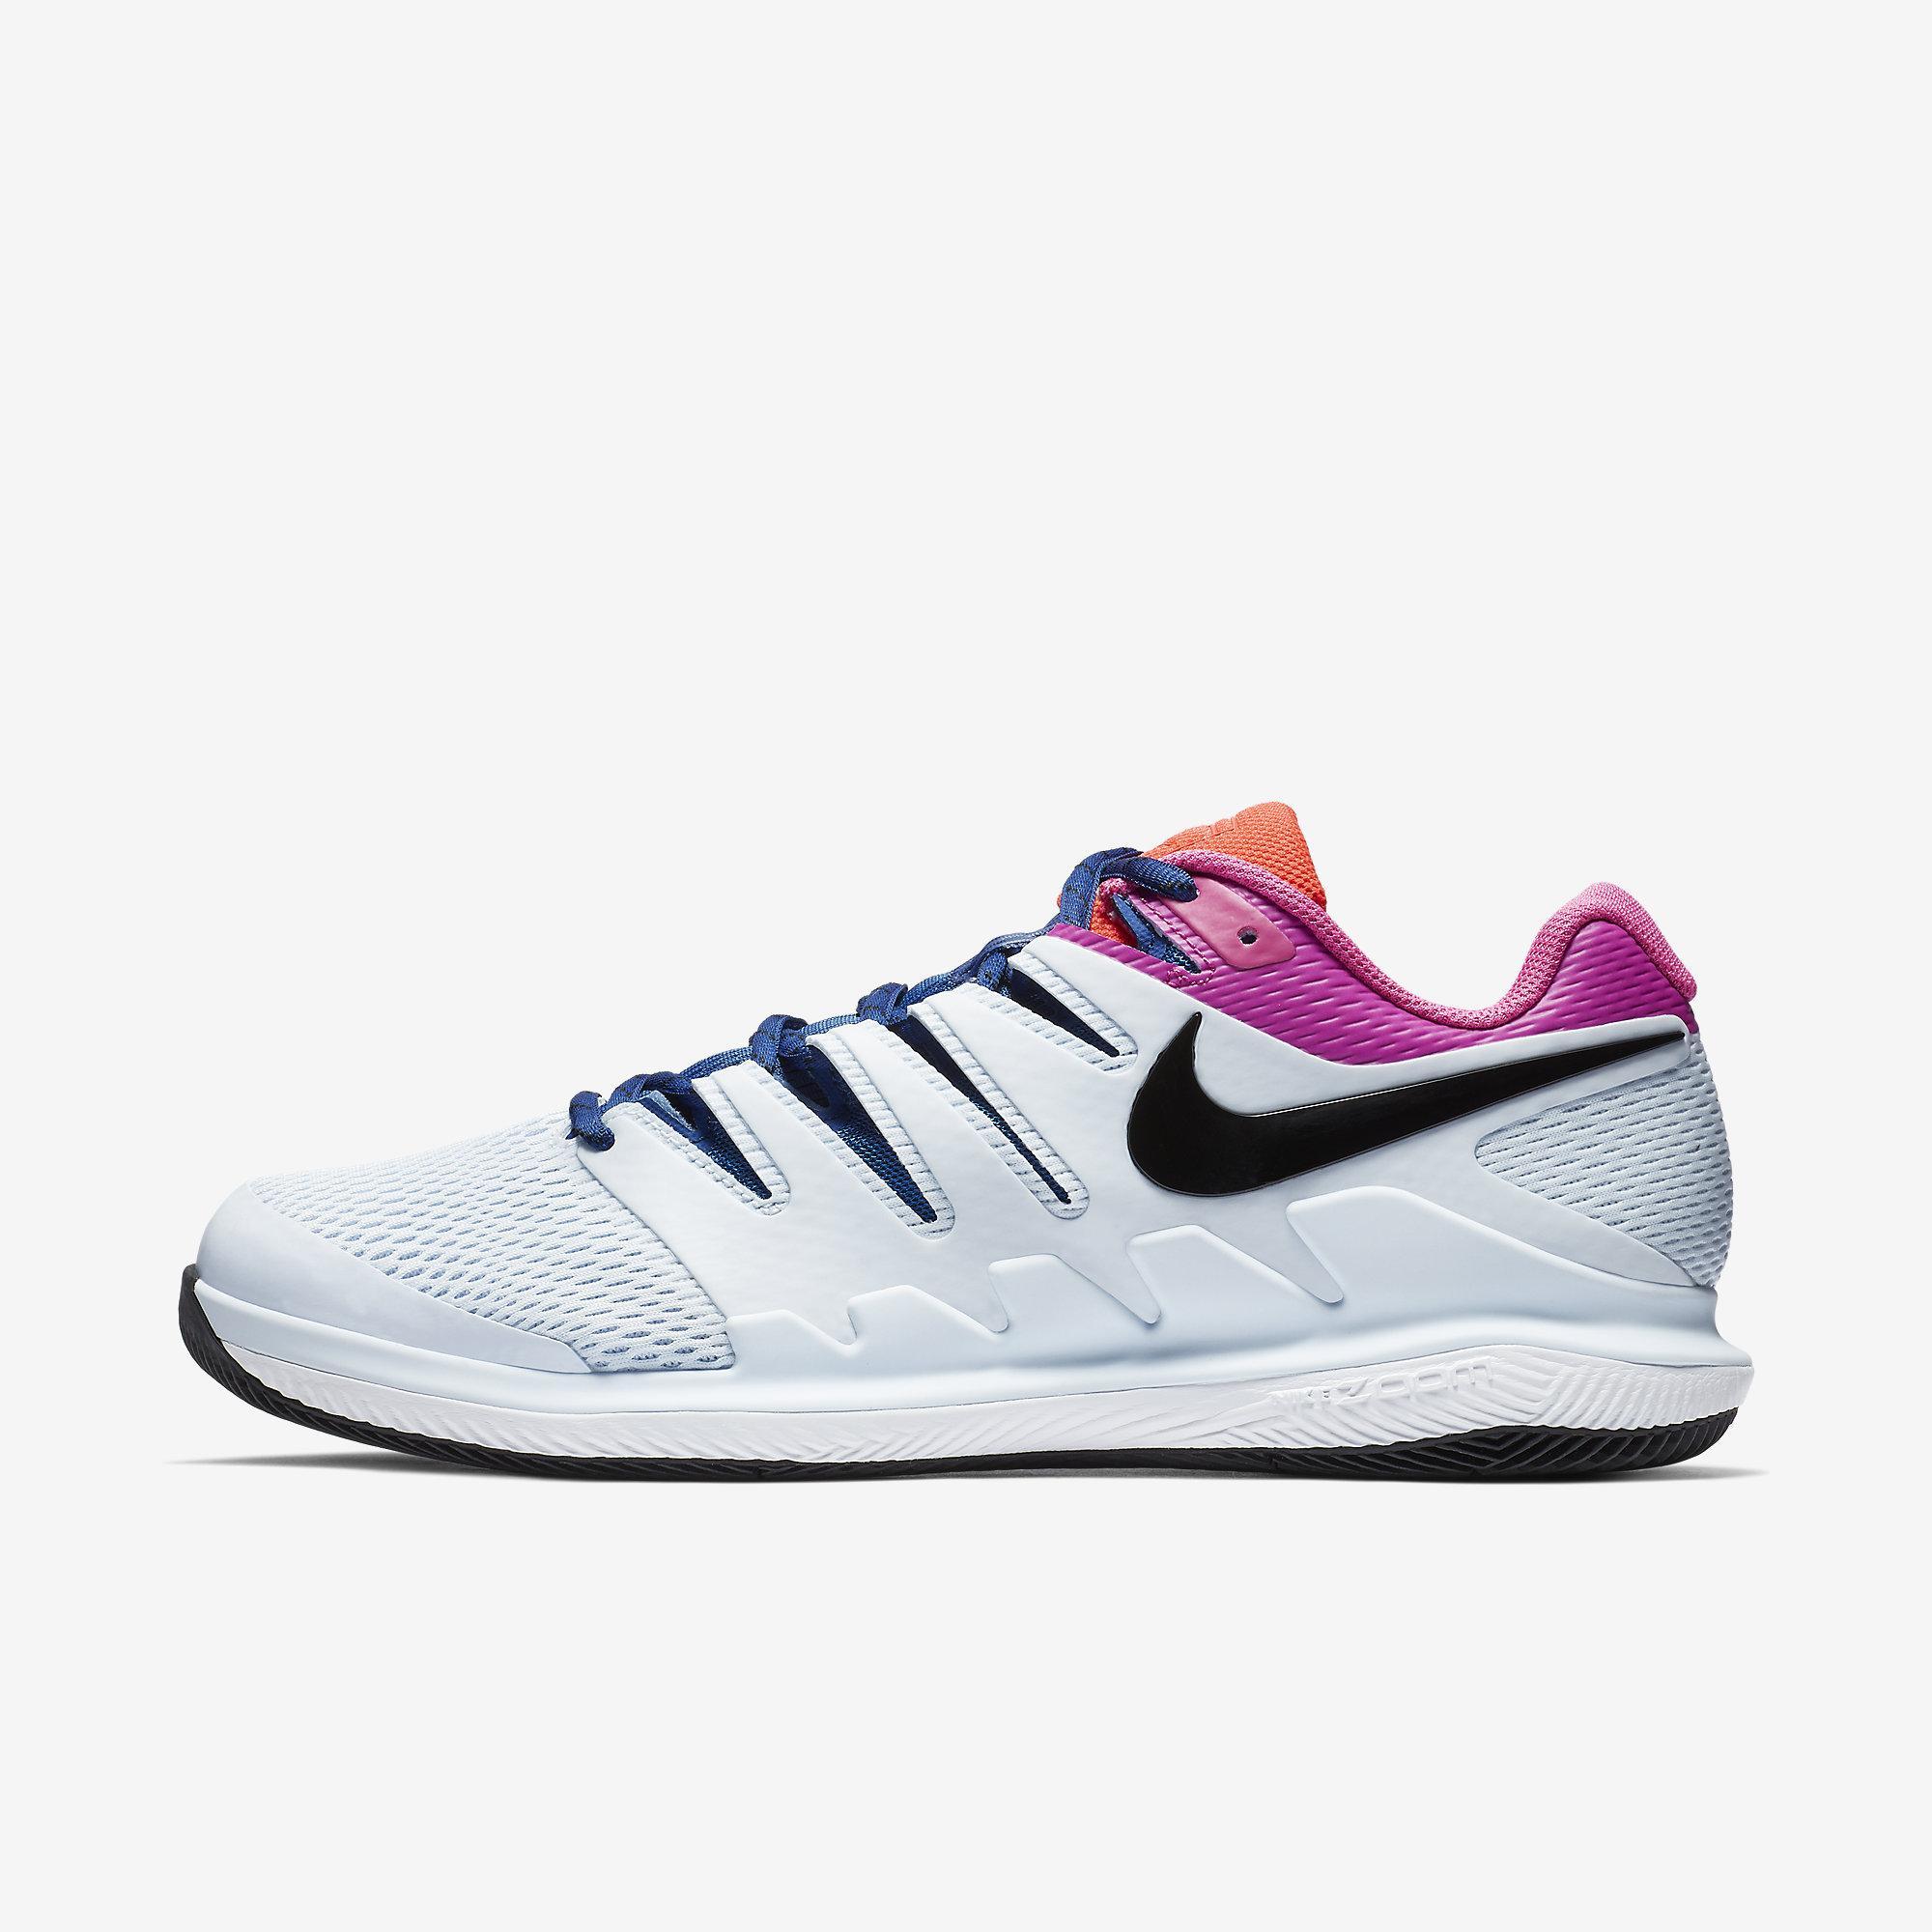 132cf934922b Nike Mens Air Zoom Vapor X Tennis Shoes - Half Blue Multi-Colour -  Tennisnuts.com